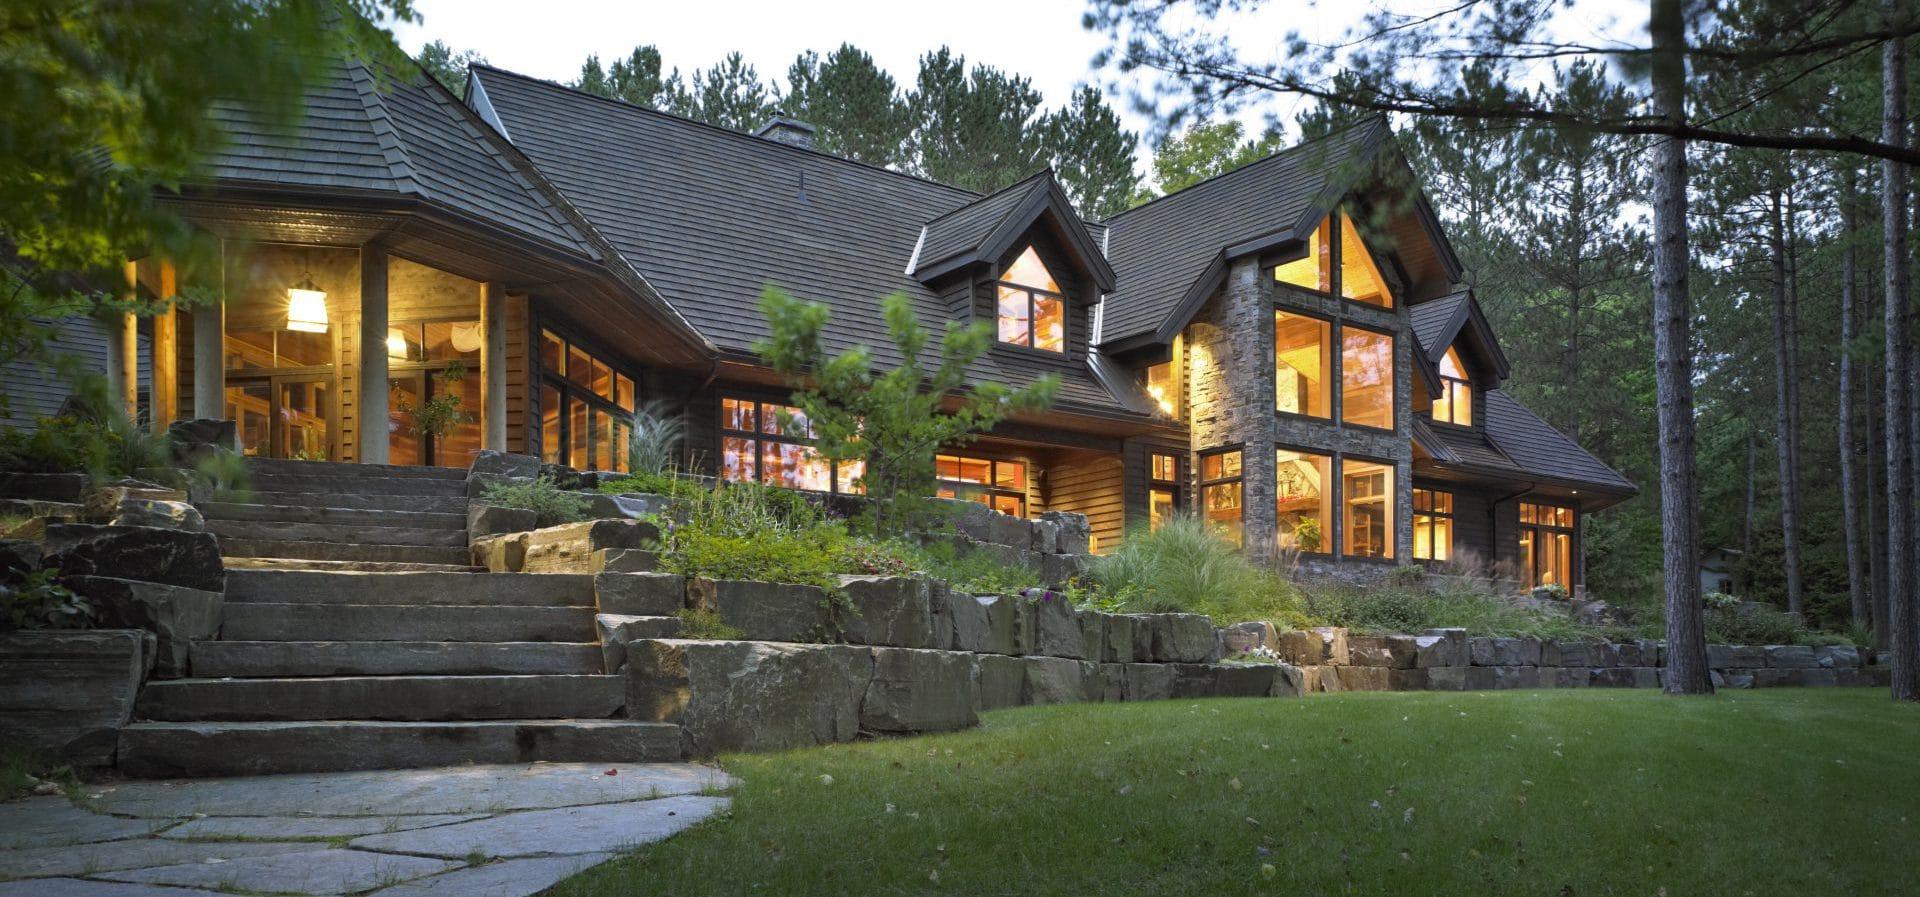 Home Majestic Peaks Custom Homes